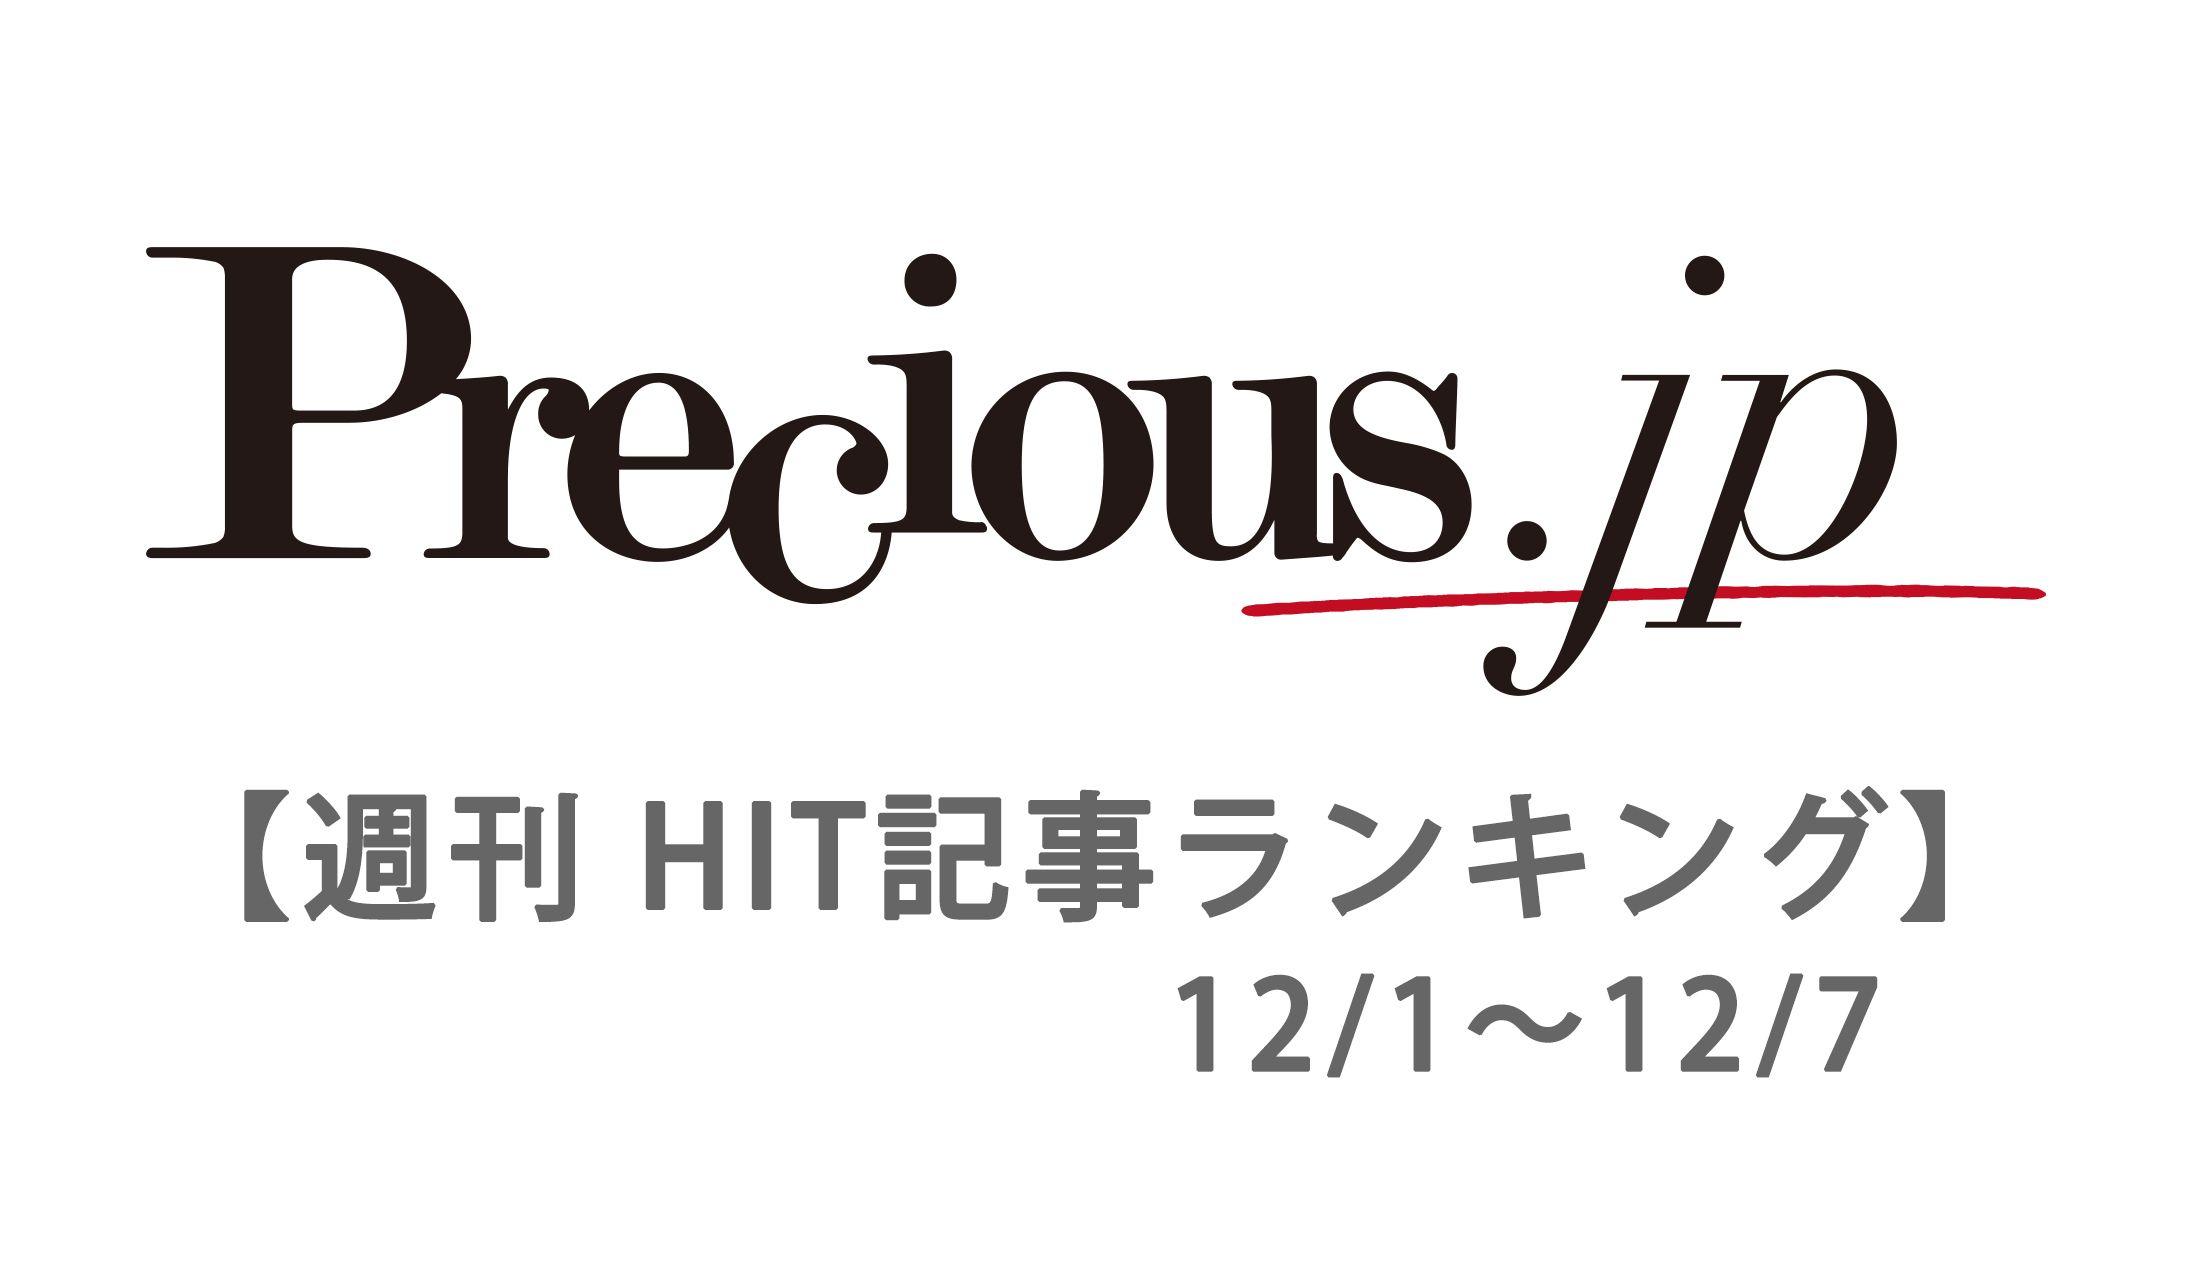 precious.jpの人気記事ランキング【12月1日~12月7日】